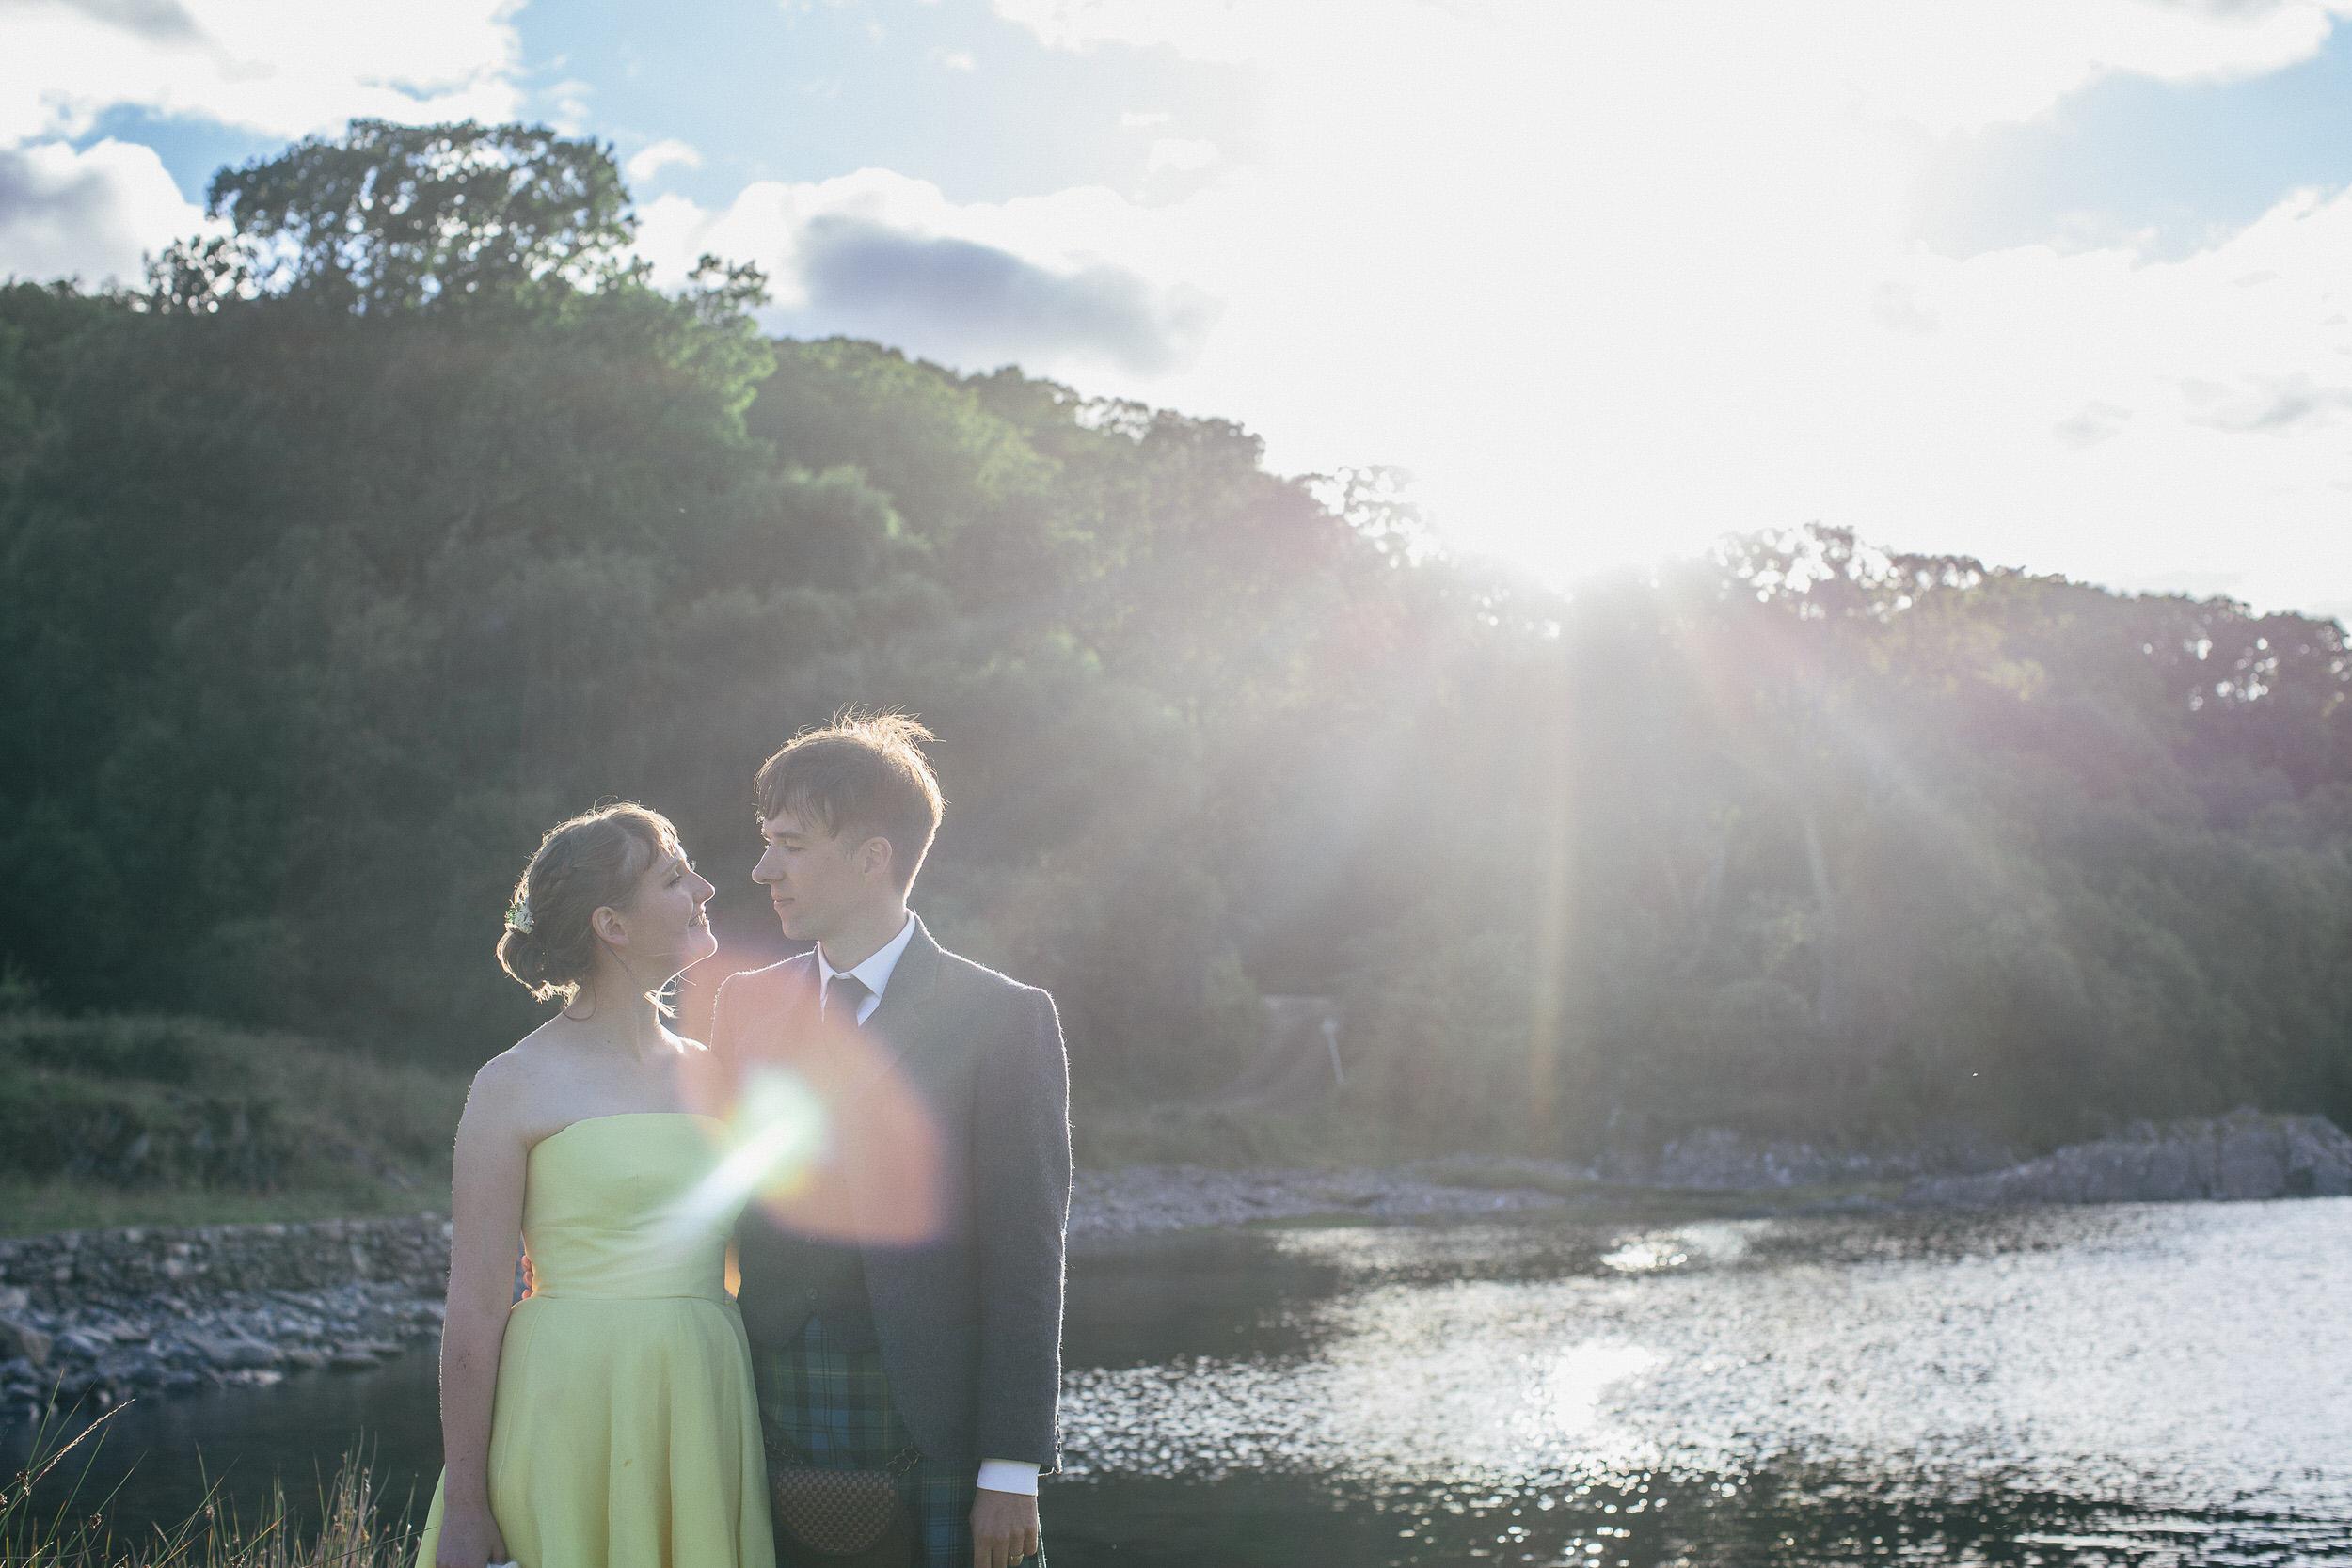 Quirky Wedding Photographer Scotland Glasgow Edinburgh Mirrorbox 156.jpg